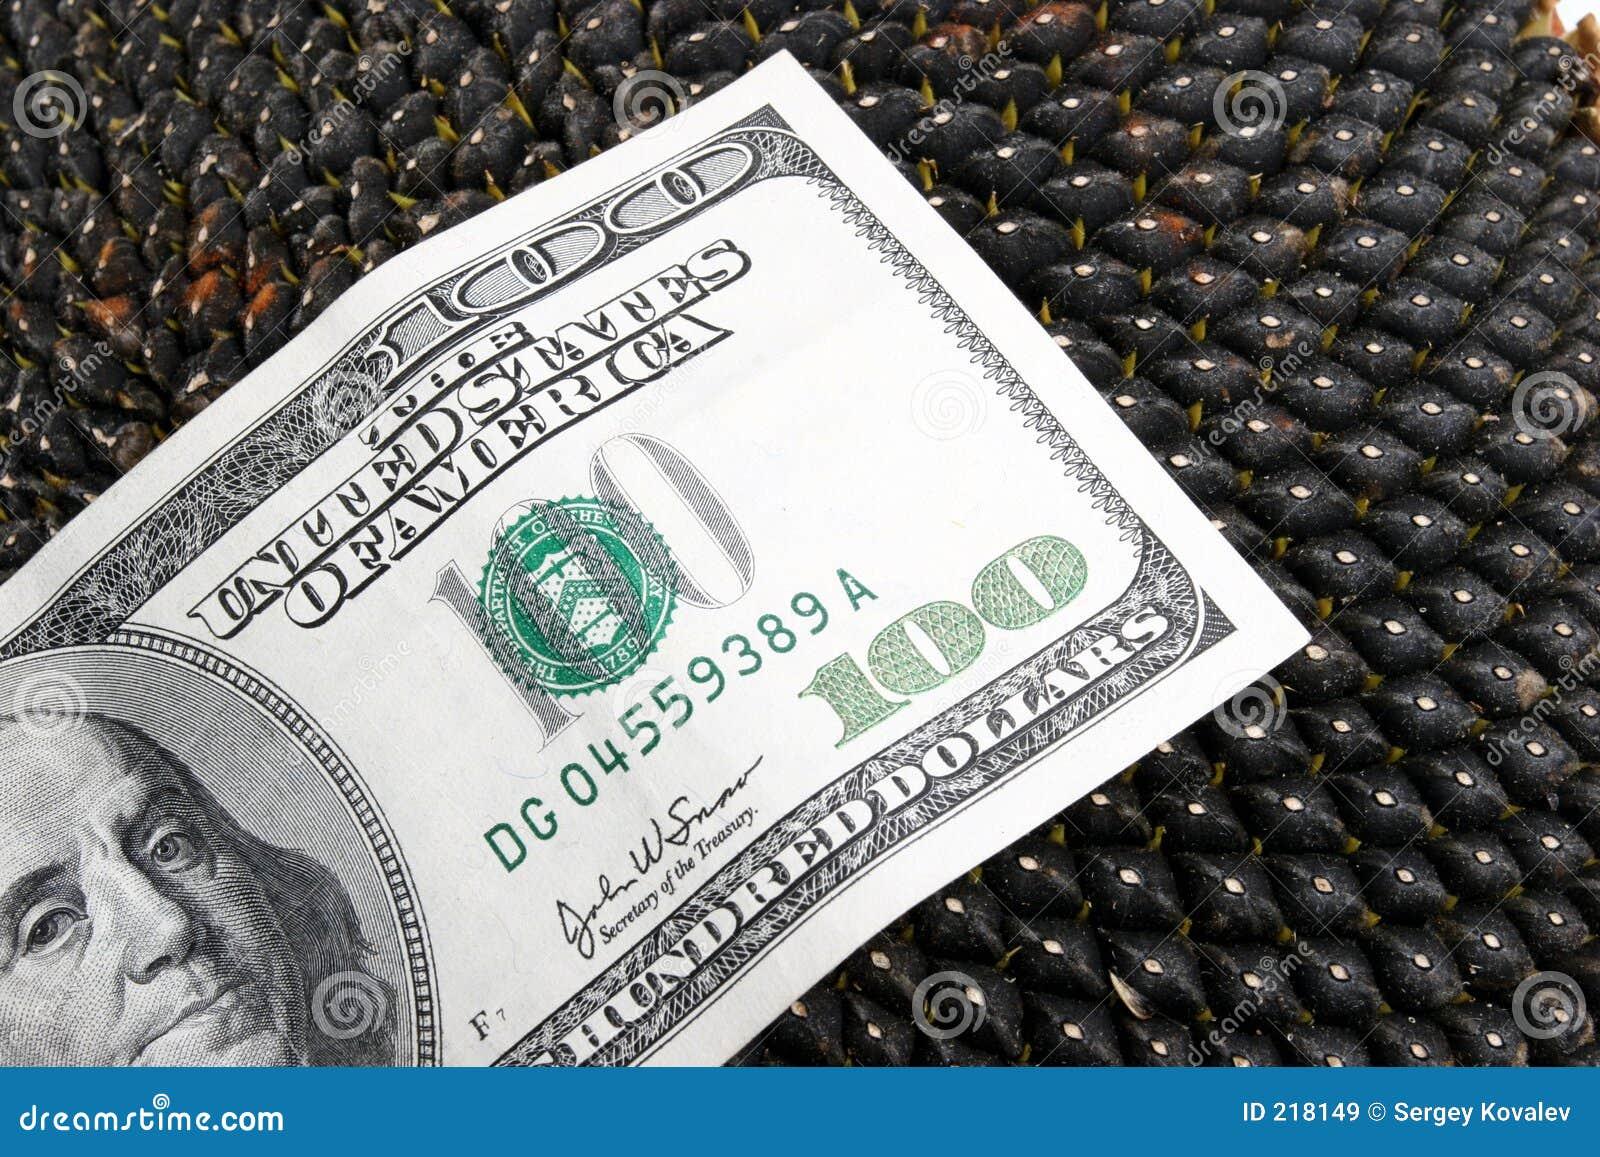 Dólar en los gérmenes de girasol de un girasol